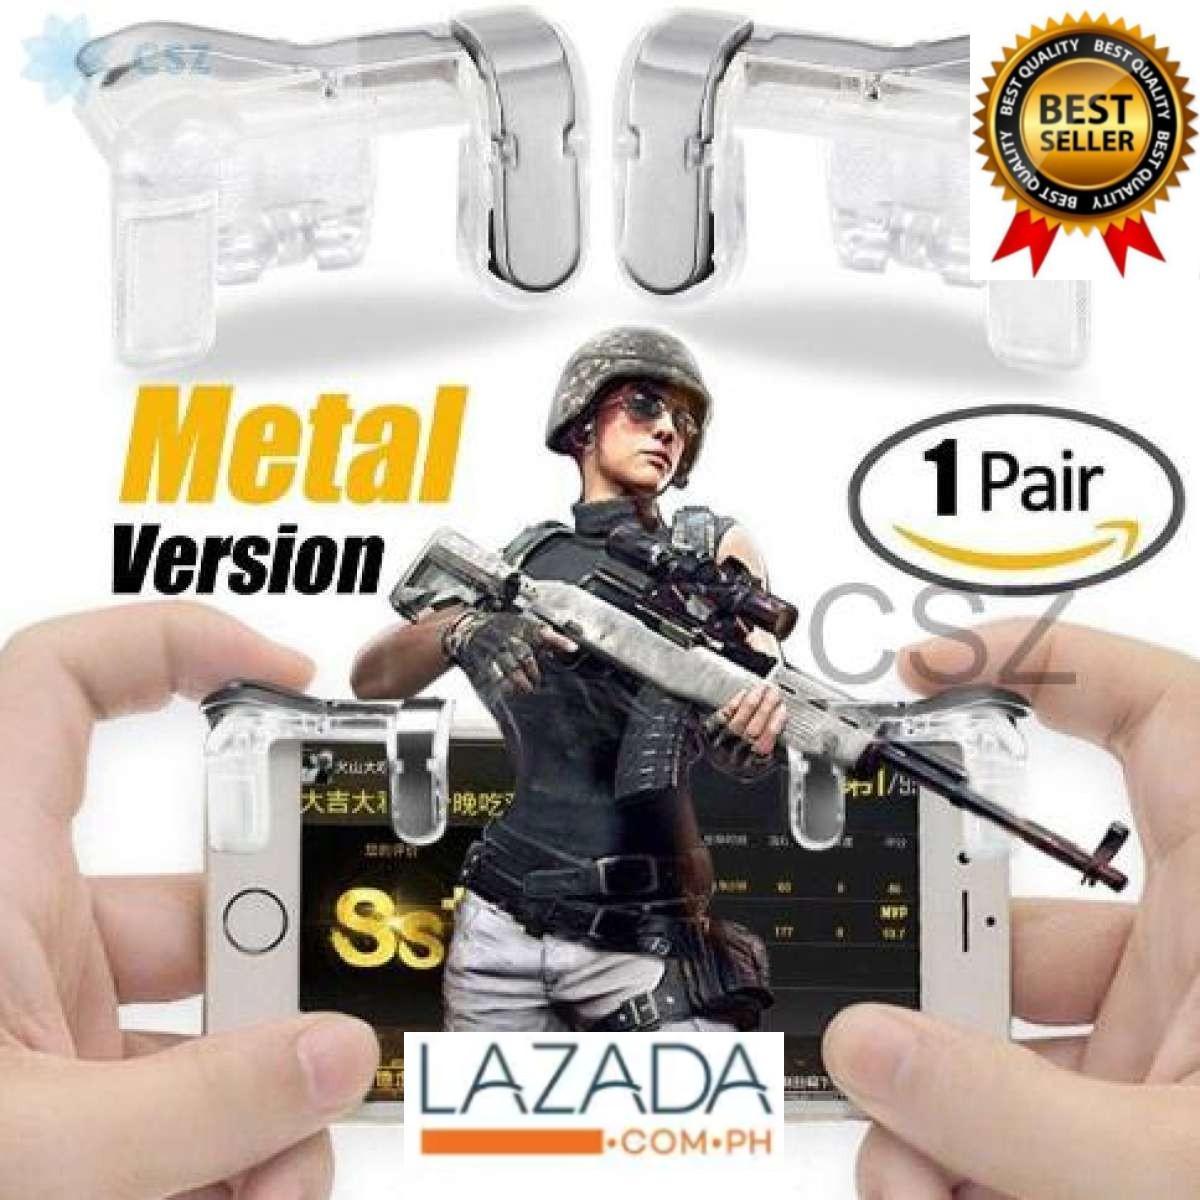 Metal Transparent Gaming Trigger L1R1 Mobile Phone PUBG Battle Grounds  Metal Trigger ROS Target Fire Button Shooter Controller L1 R1 CSZ